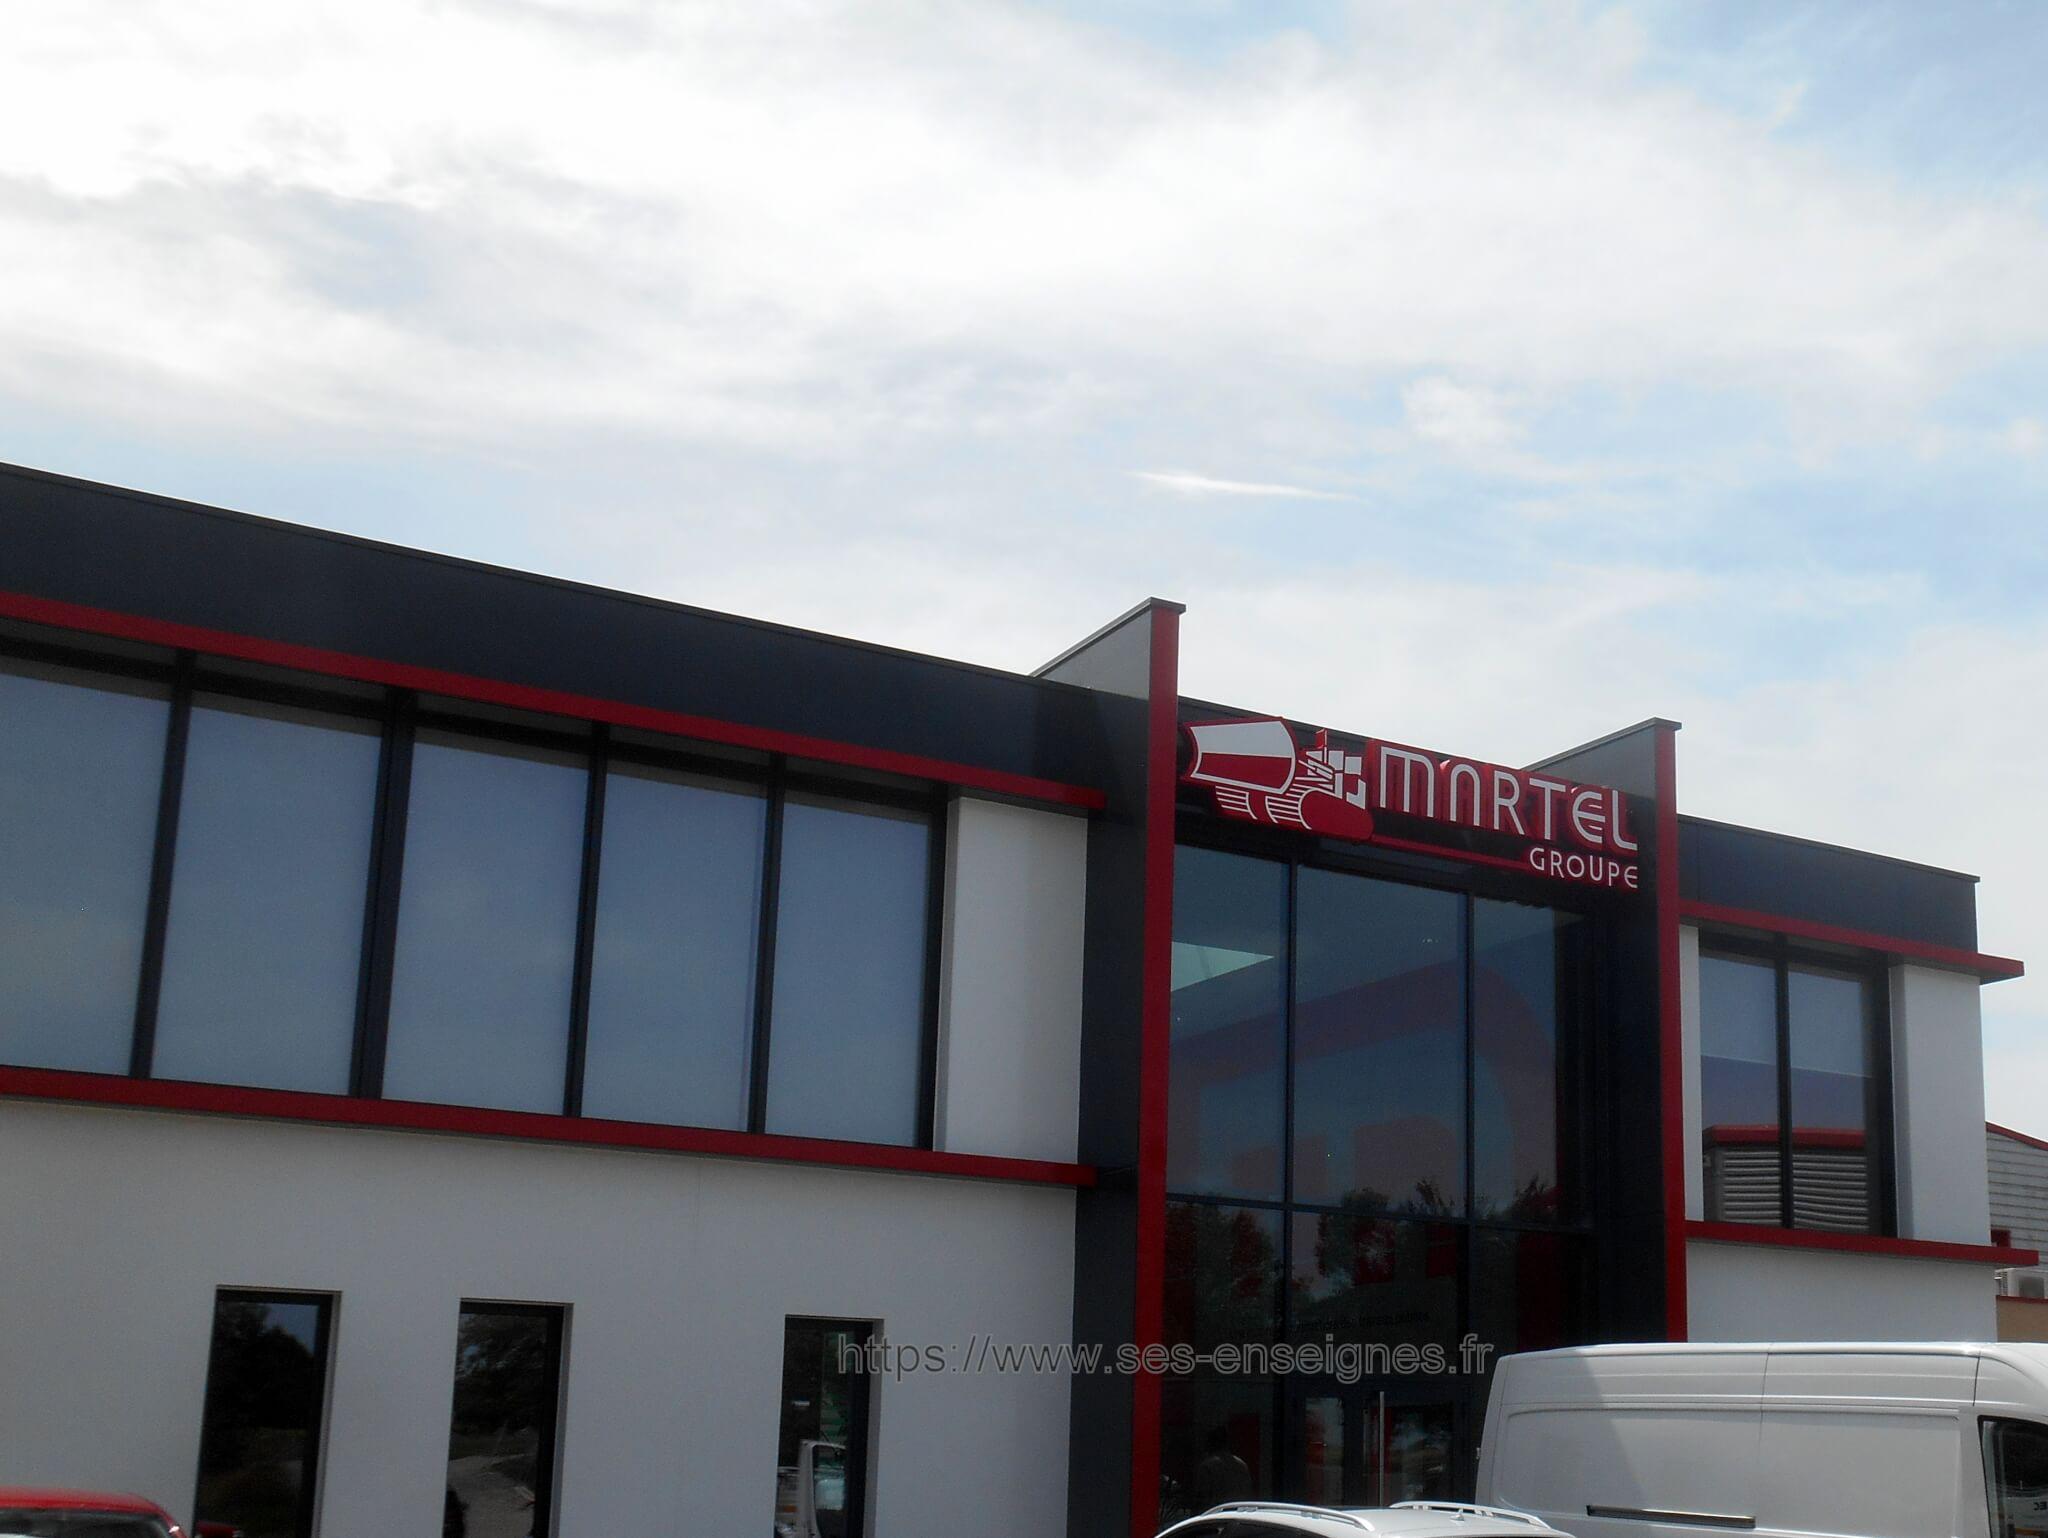 Enseigne Grand Format Lumineuse Lyon SES Grigny Fabrication et installation enseignes Lyon pour Groupe Martel